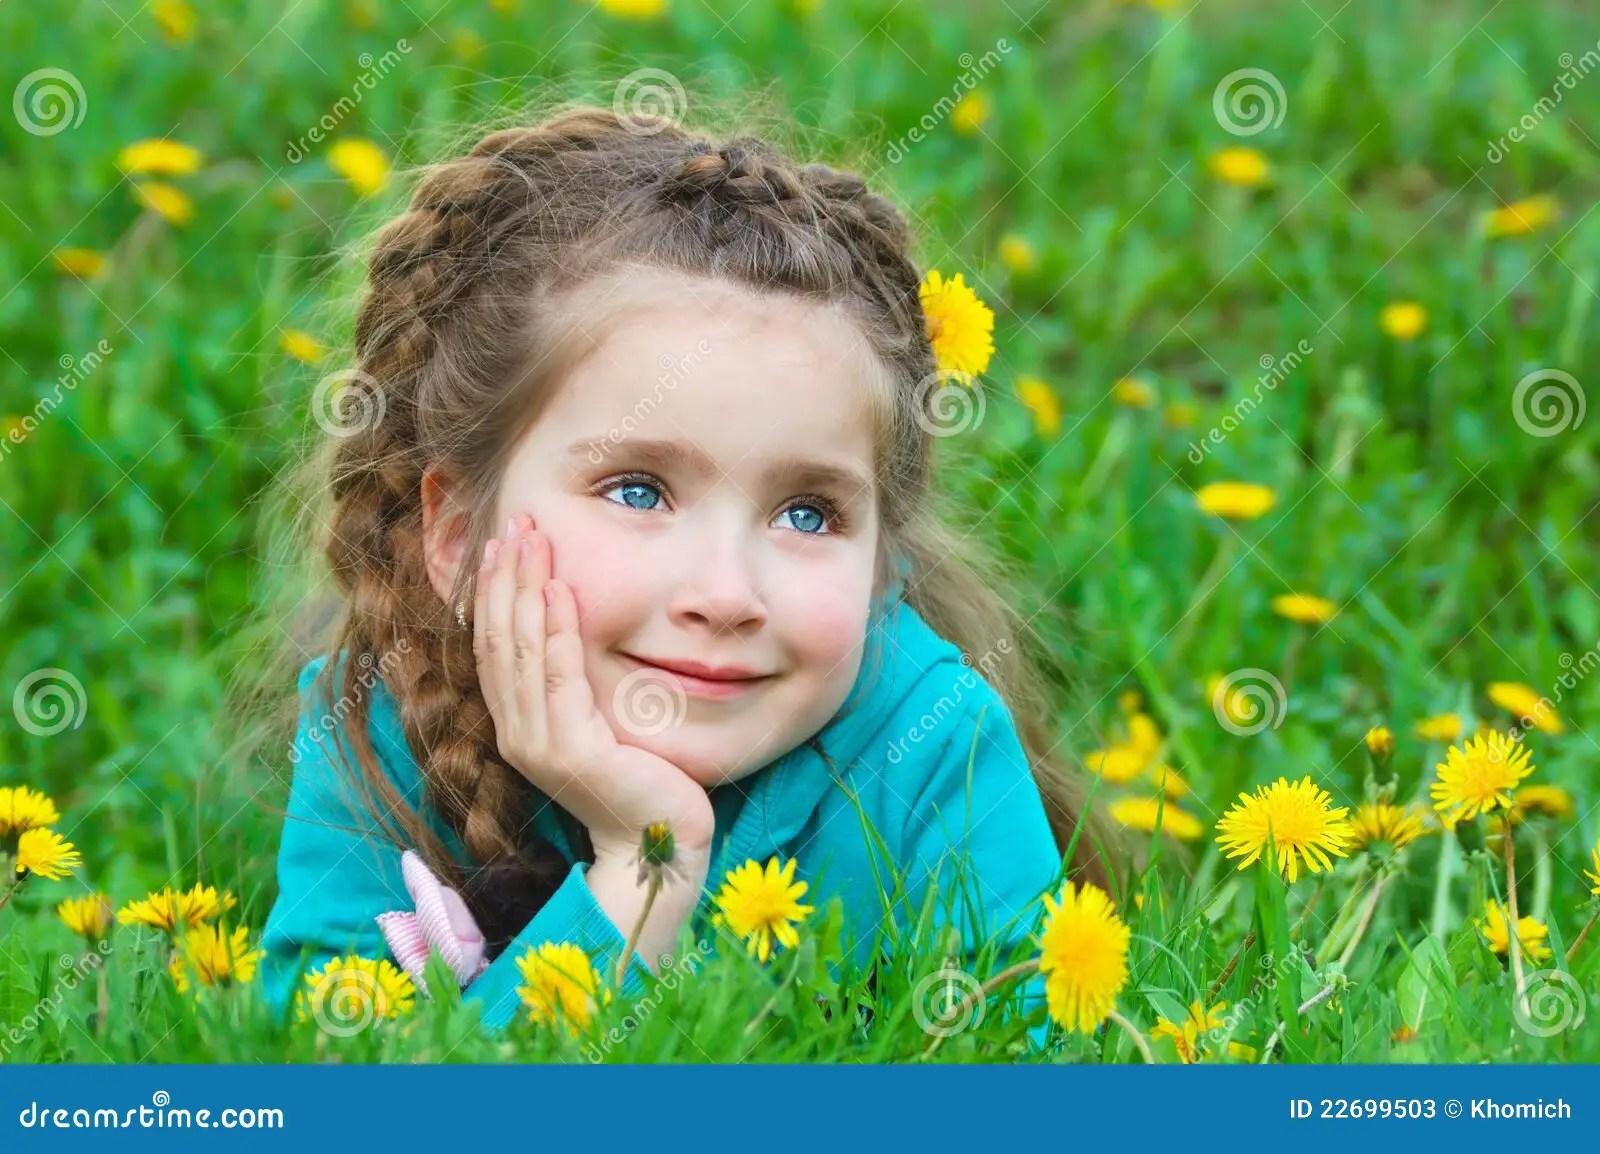 cute little girl dreaming